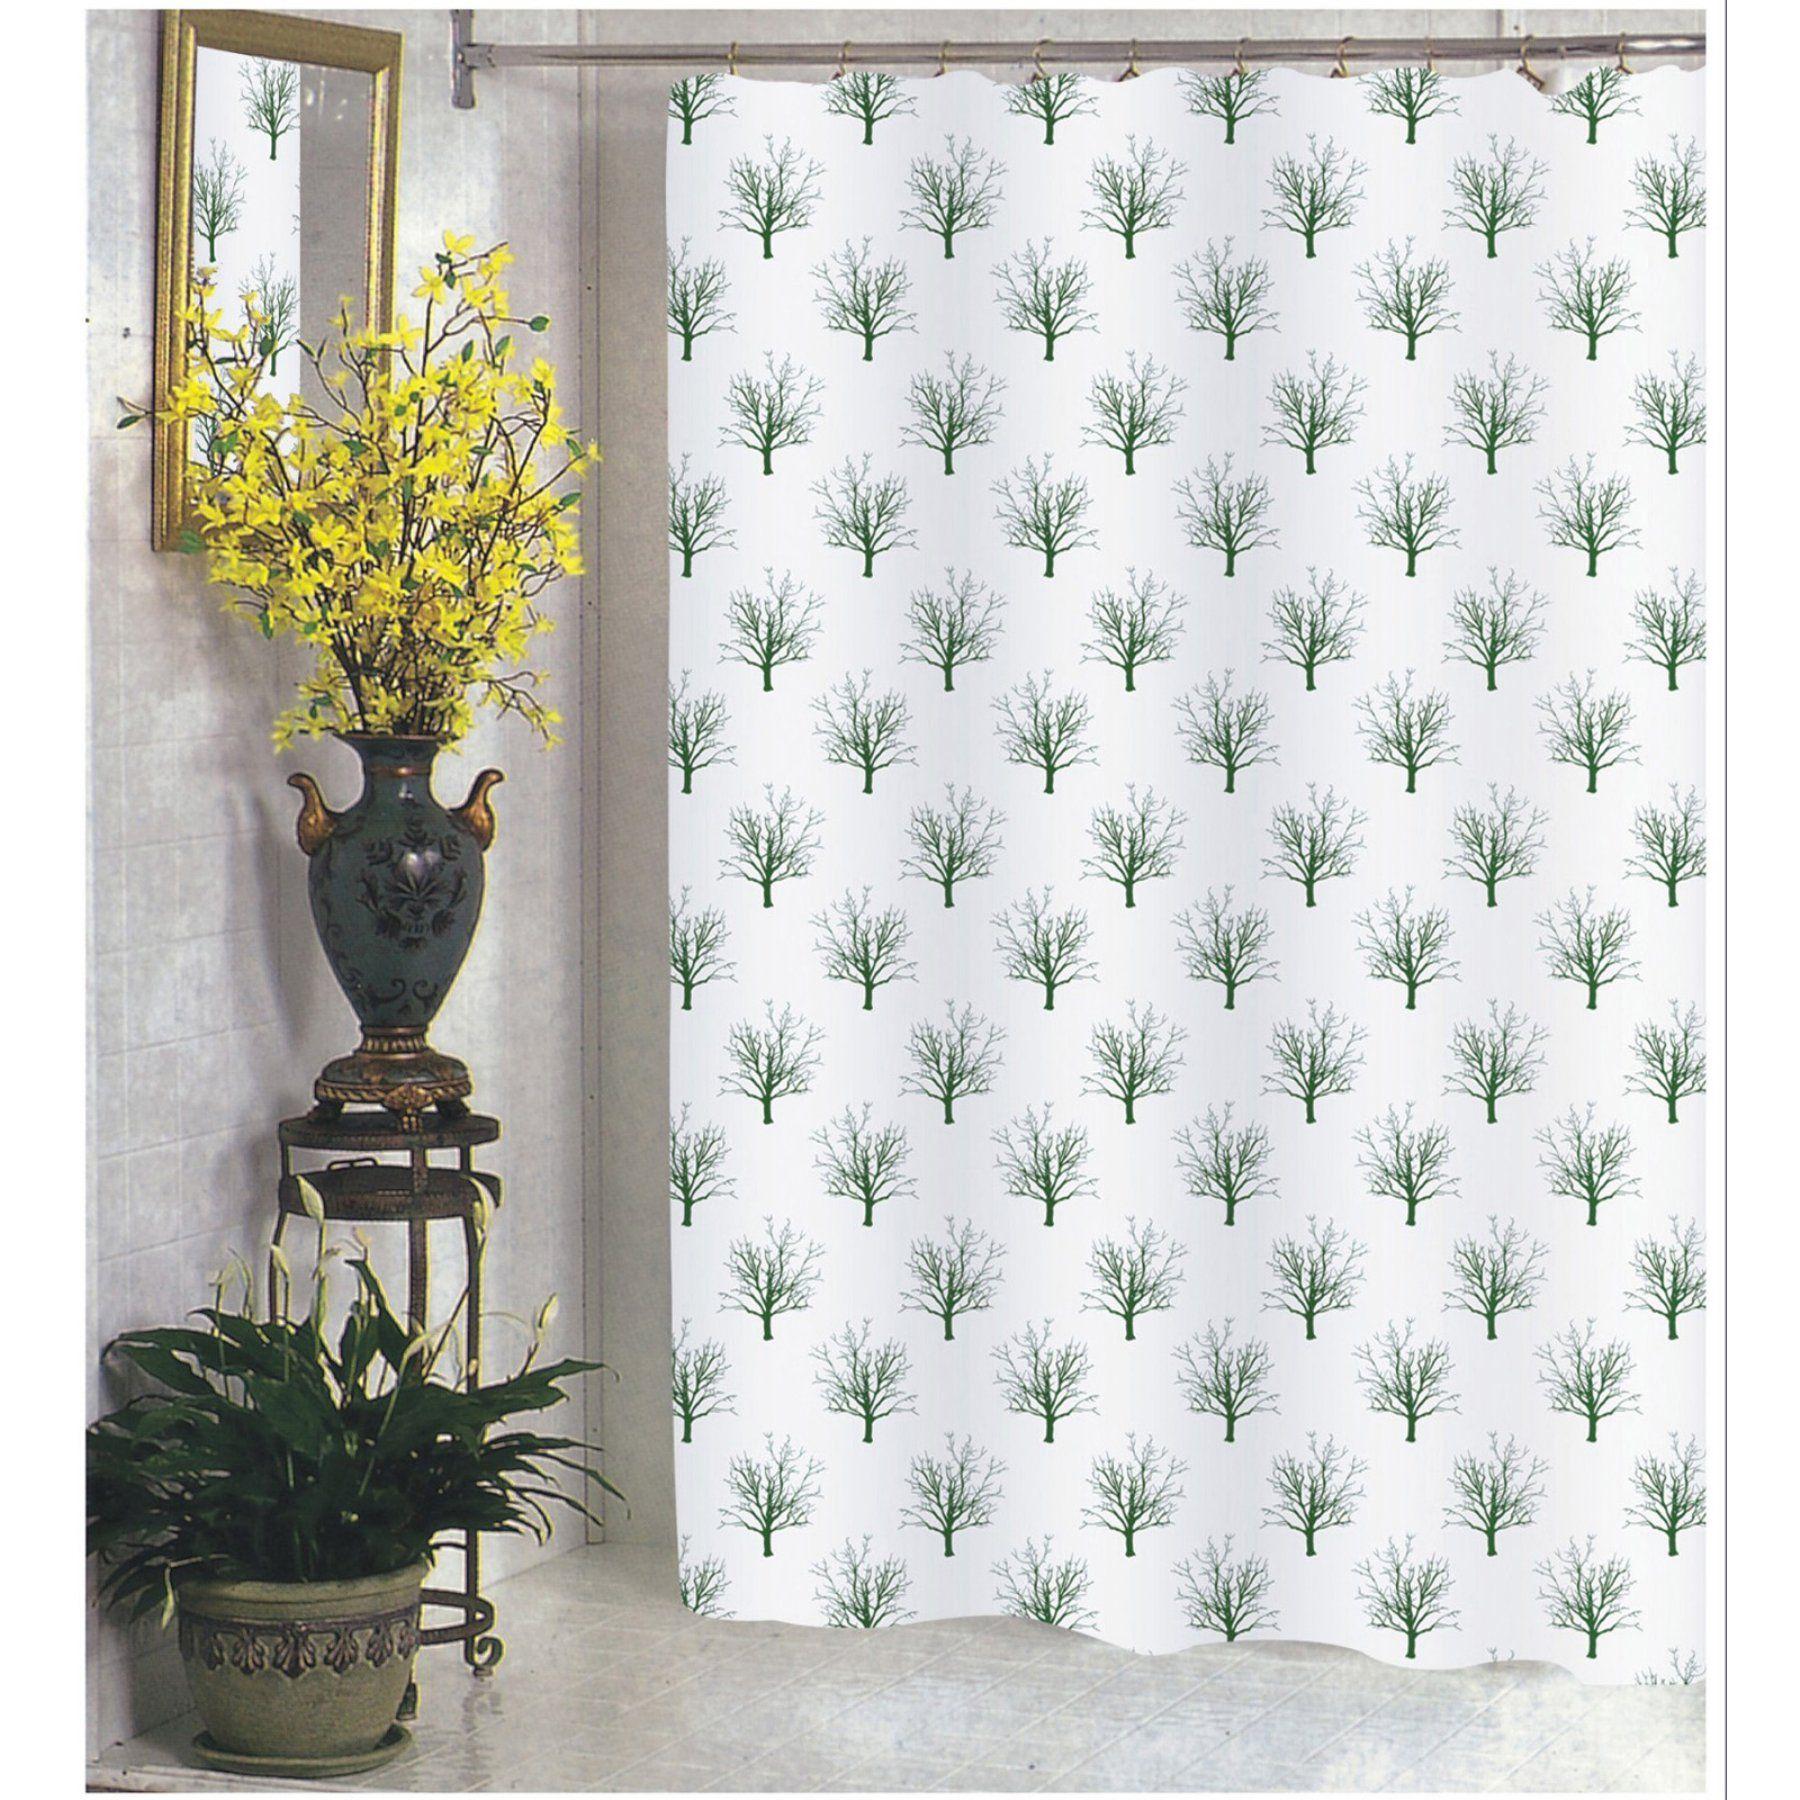 Carnation Home Fashions Faith Tree In Green Fabric Shower Curtain